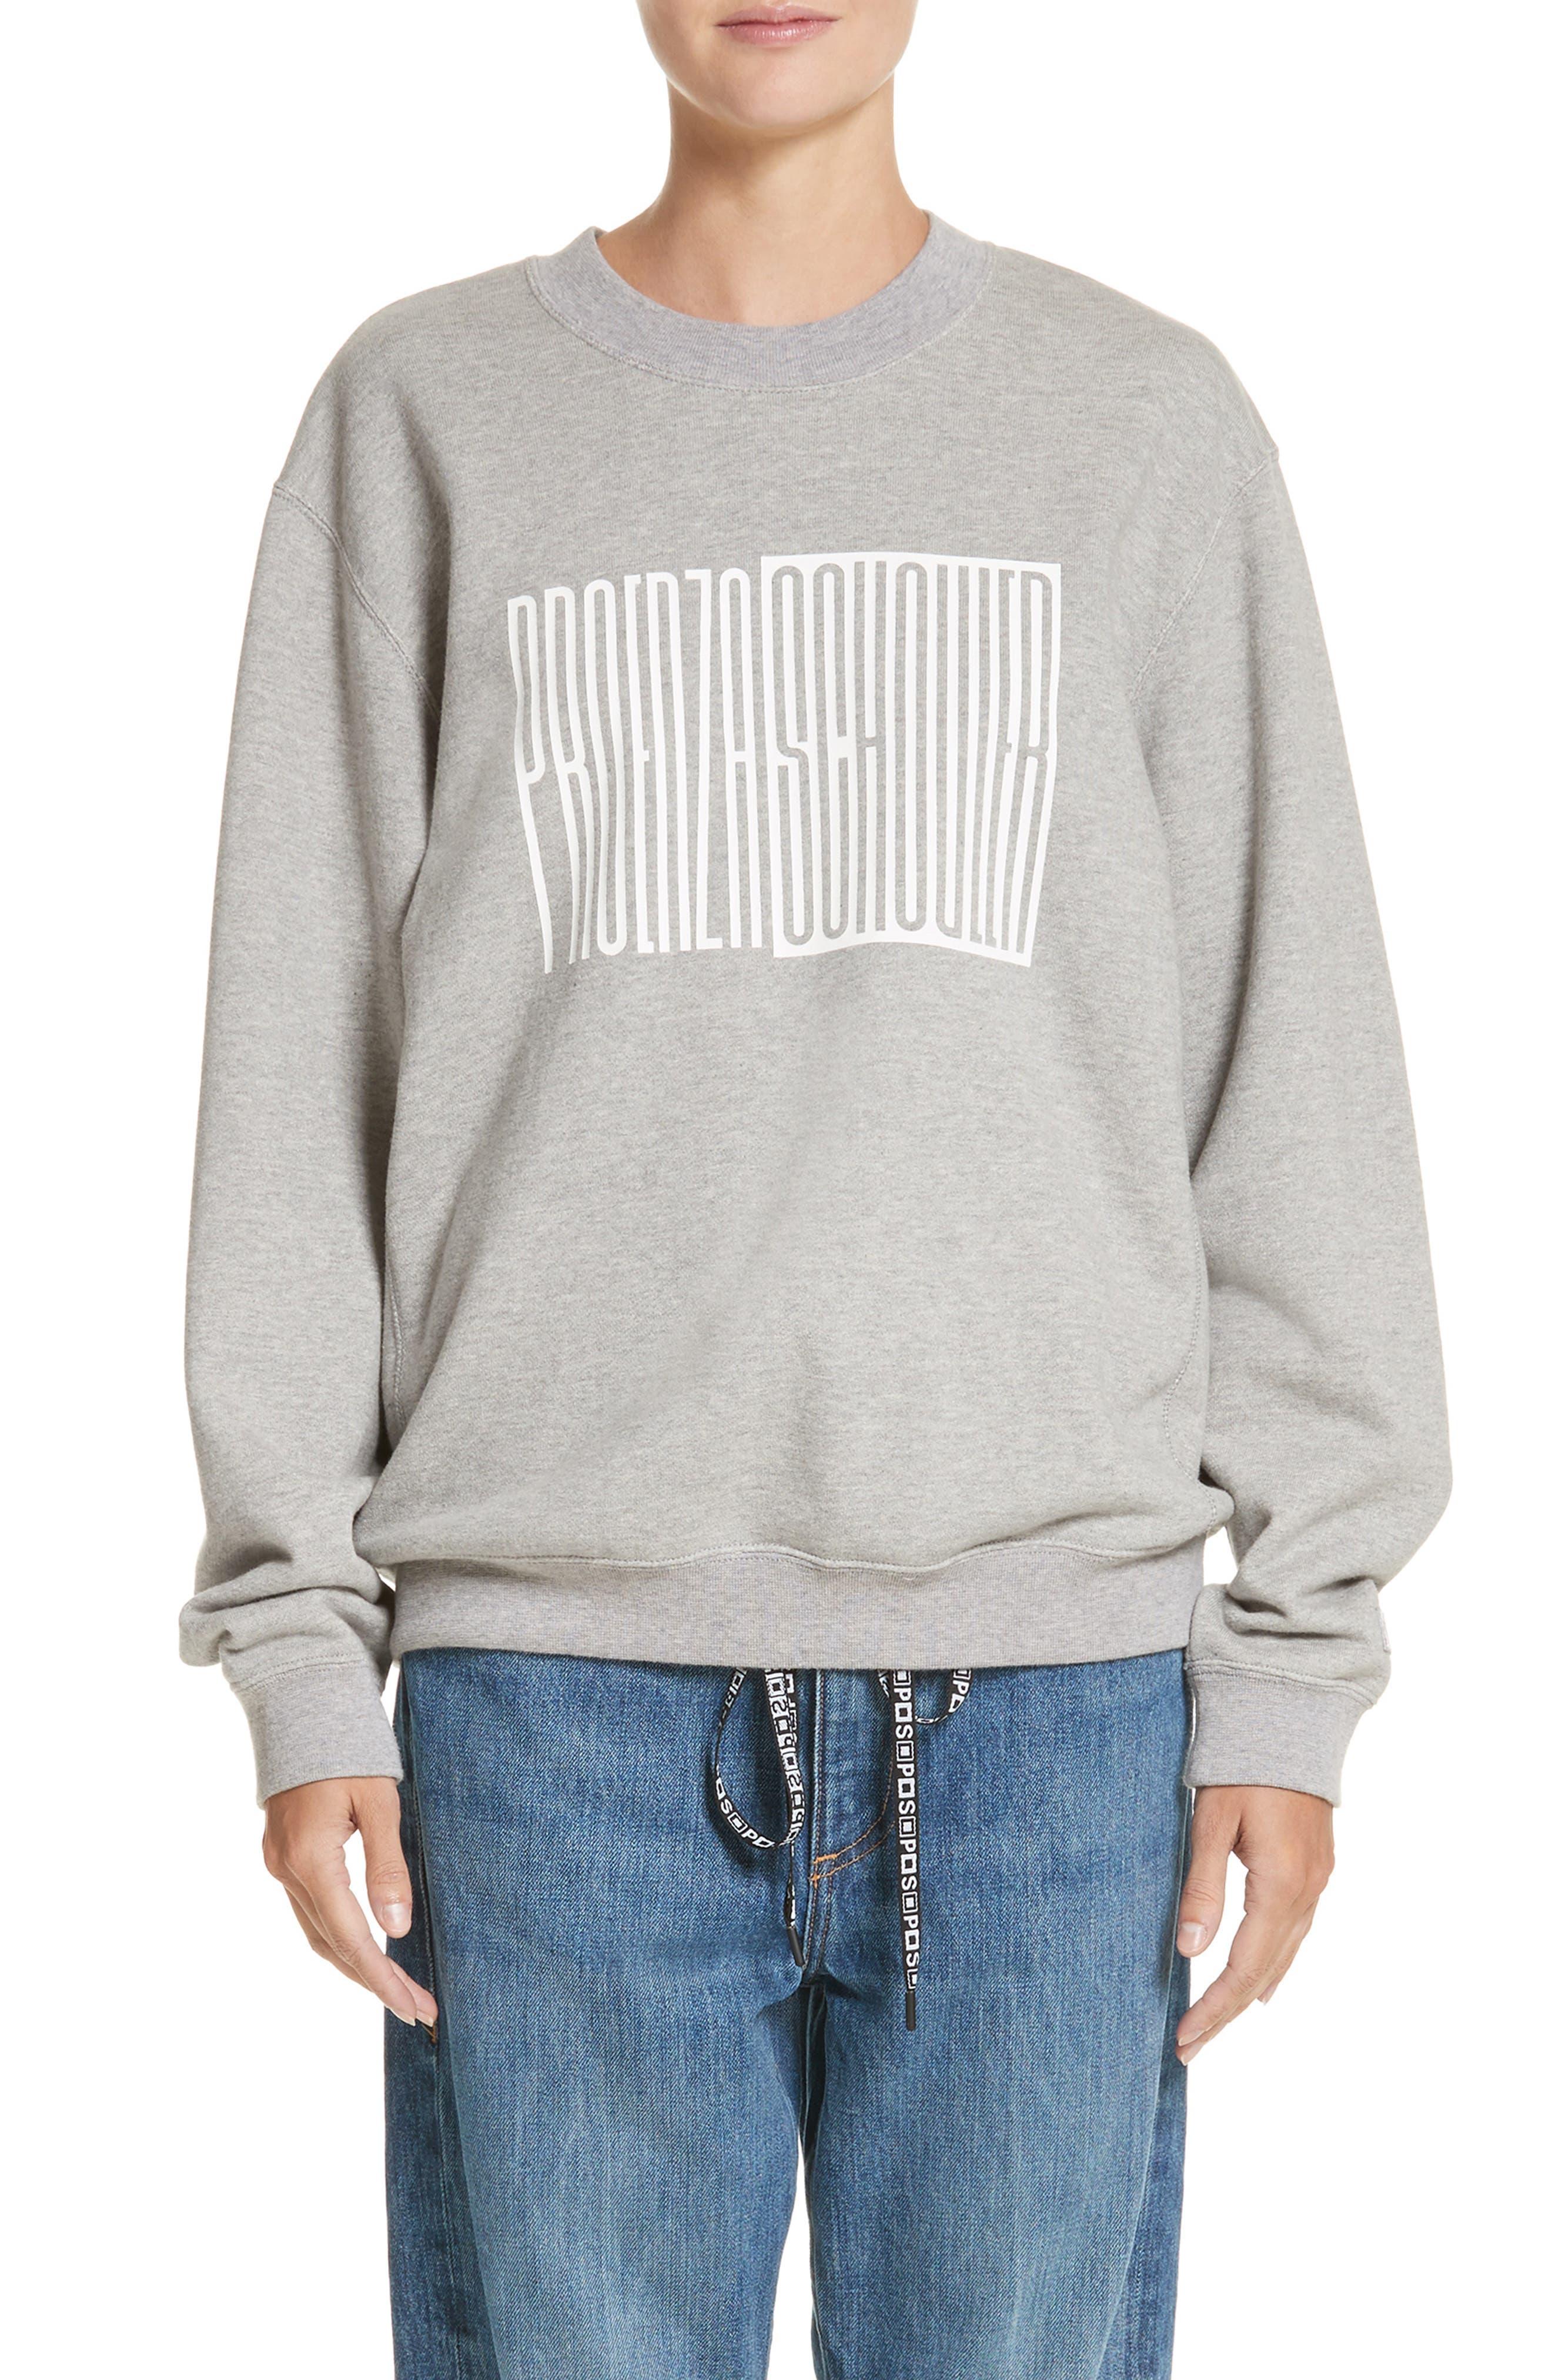 PSWL Graphic Jersey Oversize Sweatshirt,                             Main thumbnail 1, color,                             Grey Melange/ White Logo